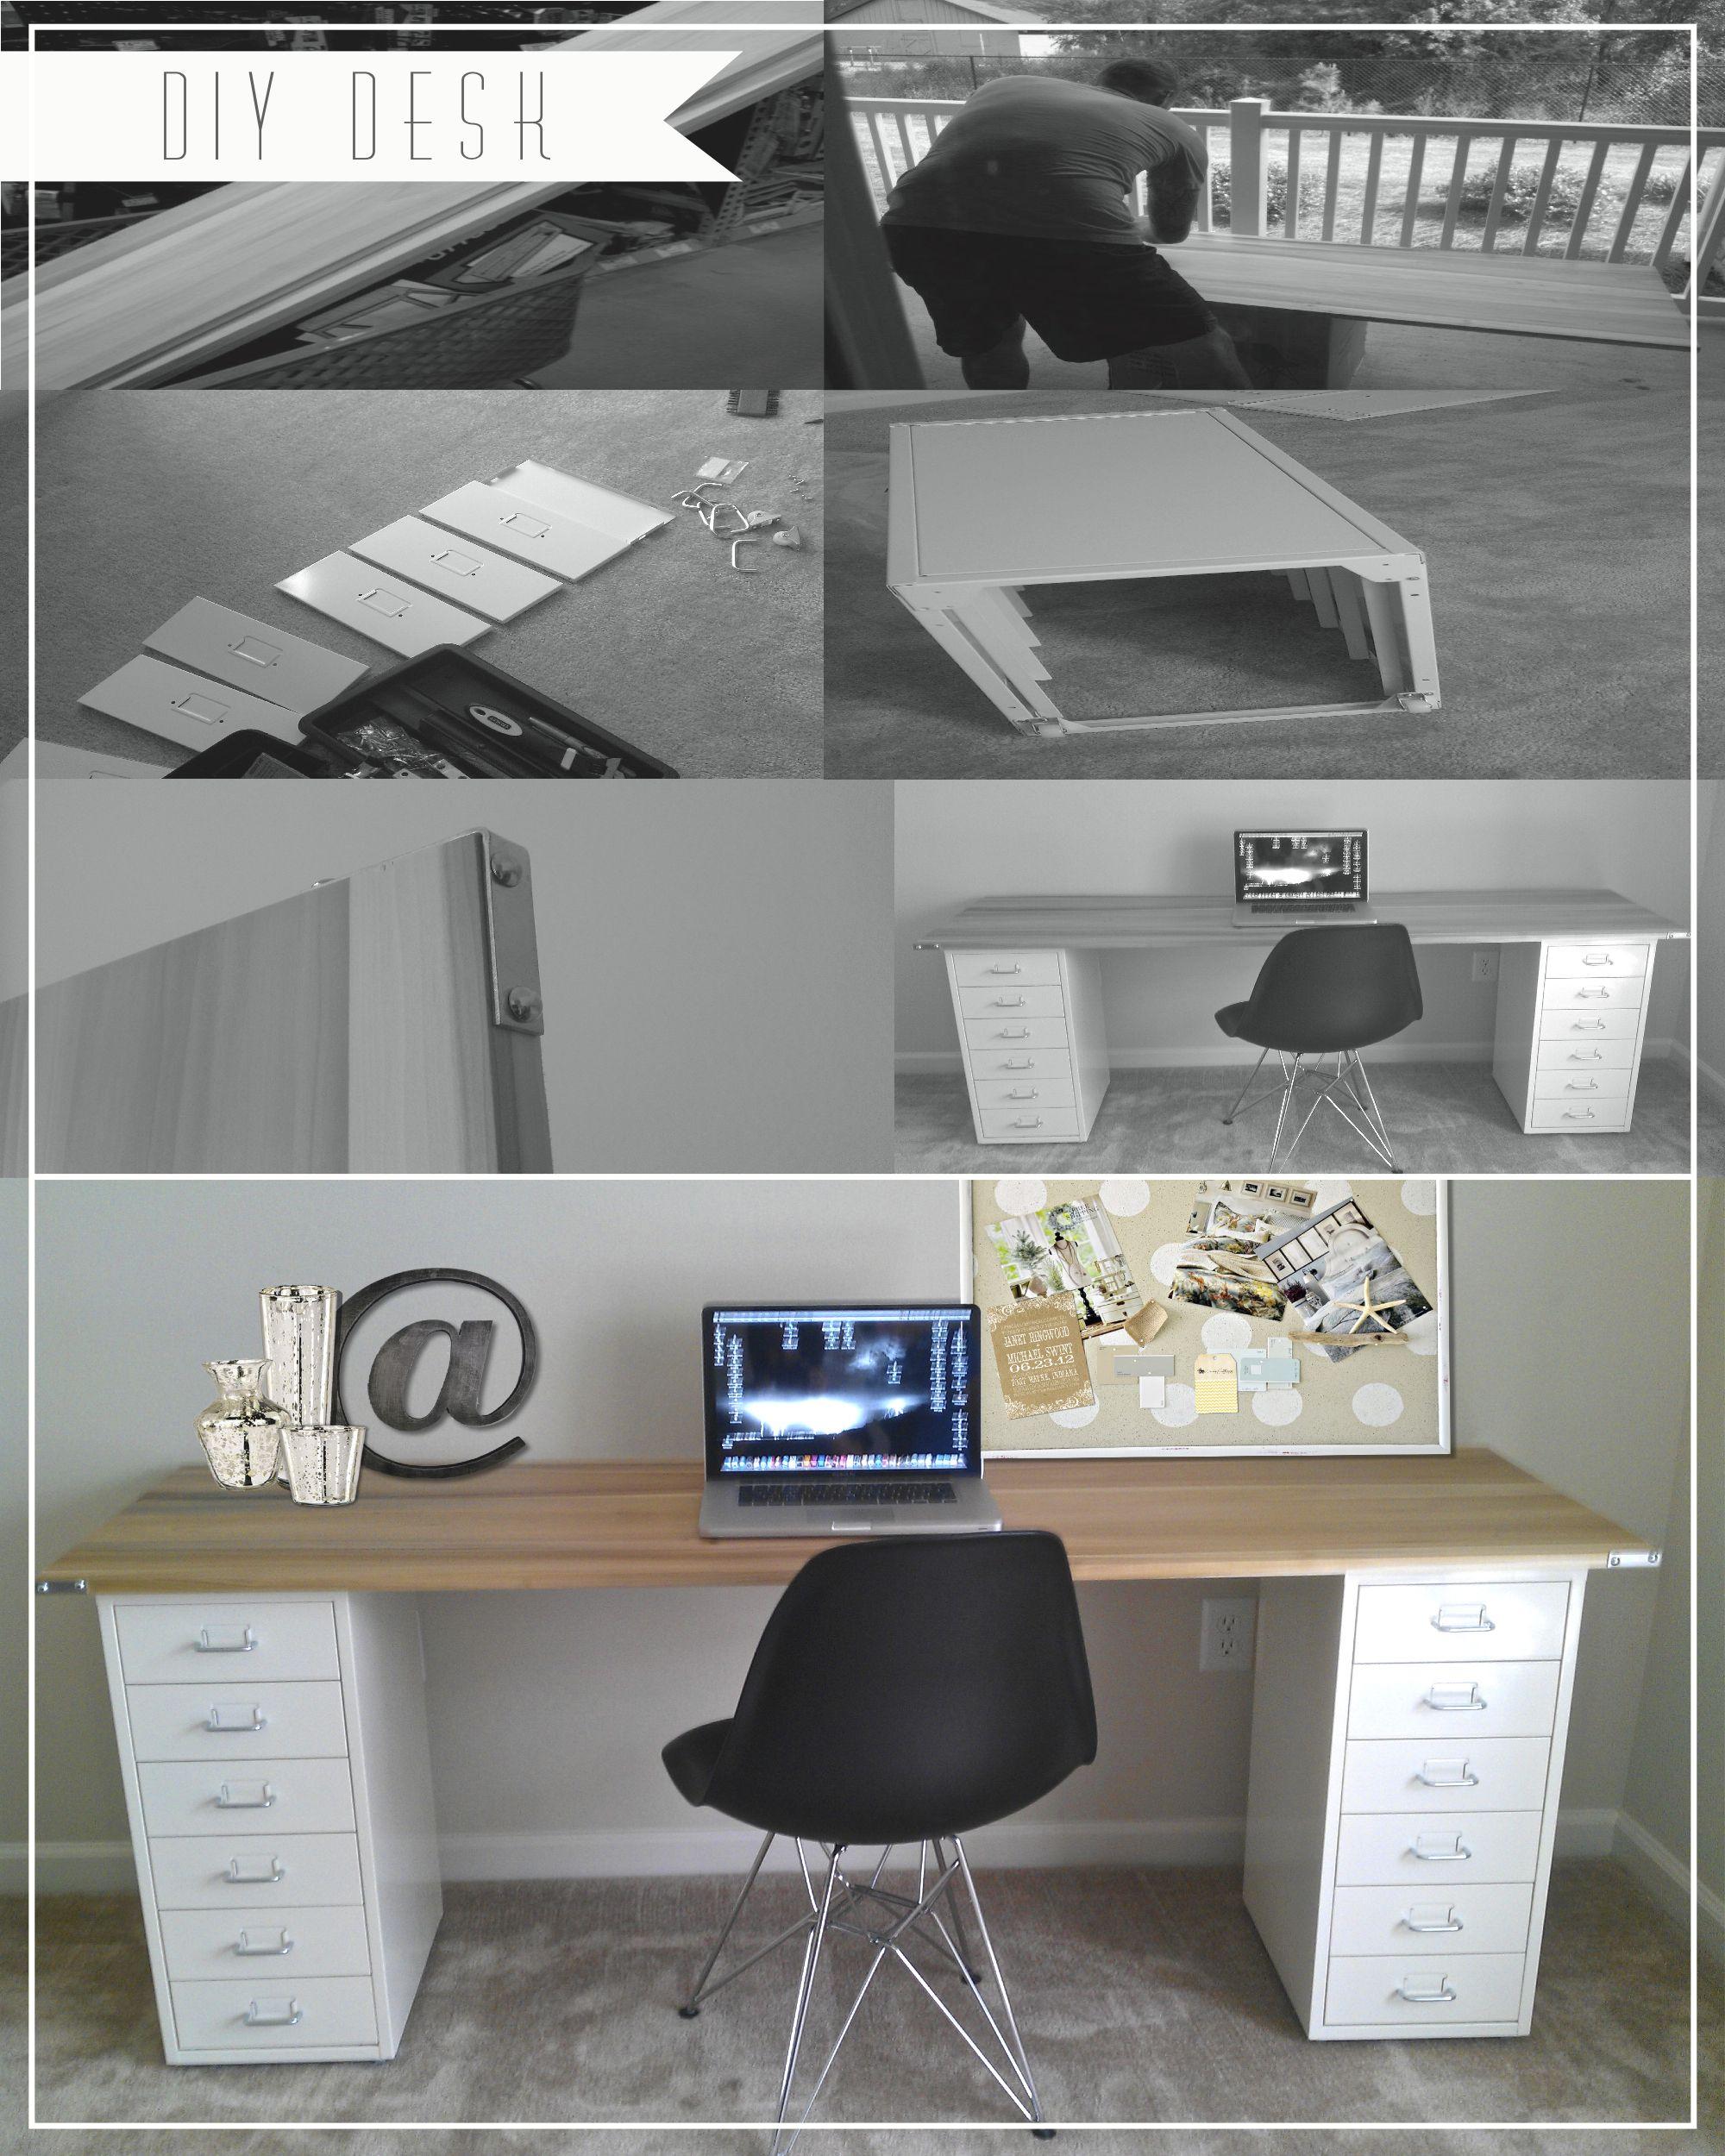 DIY Desk poplar wood & metal corner brackets from Home